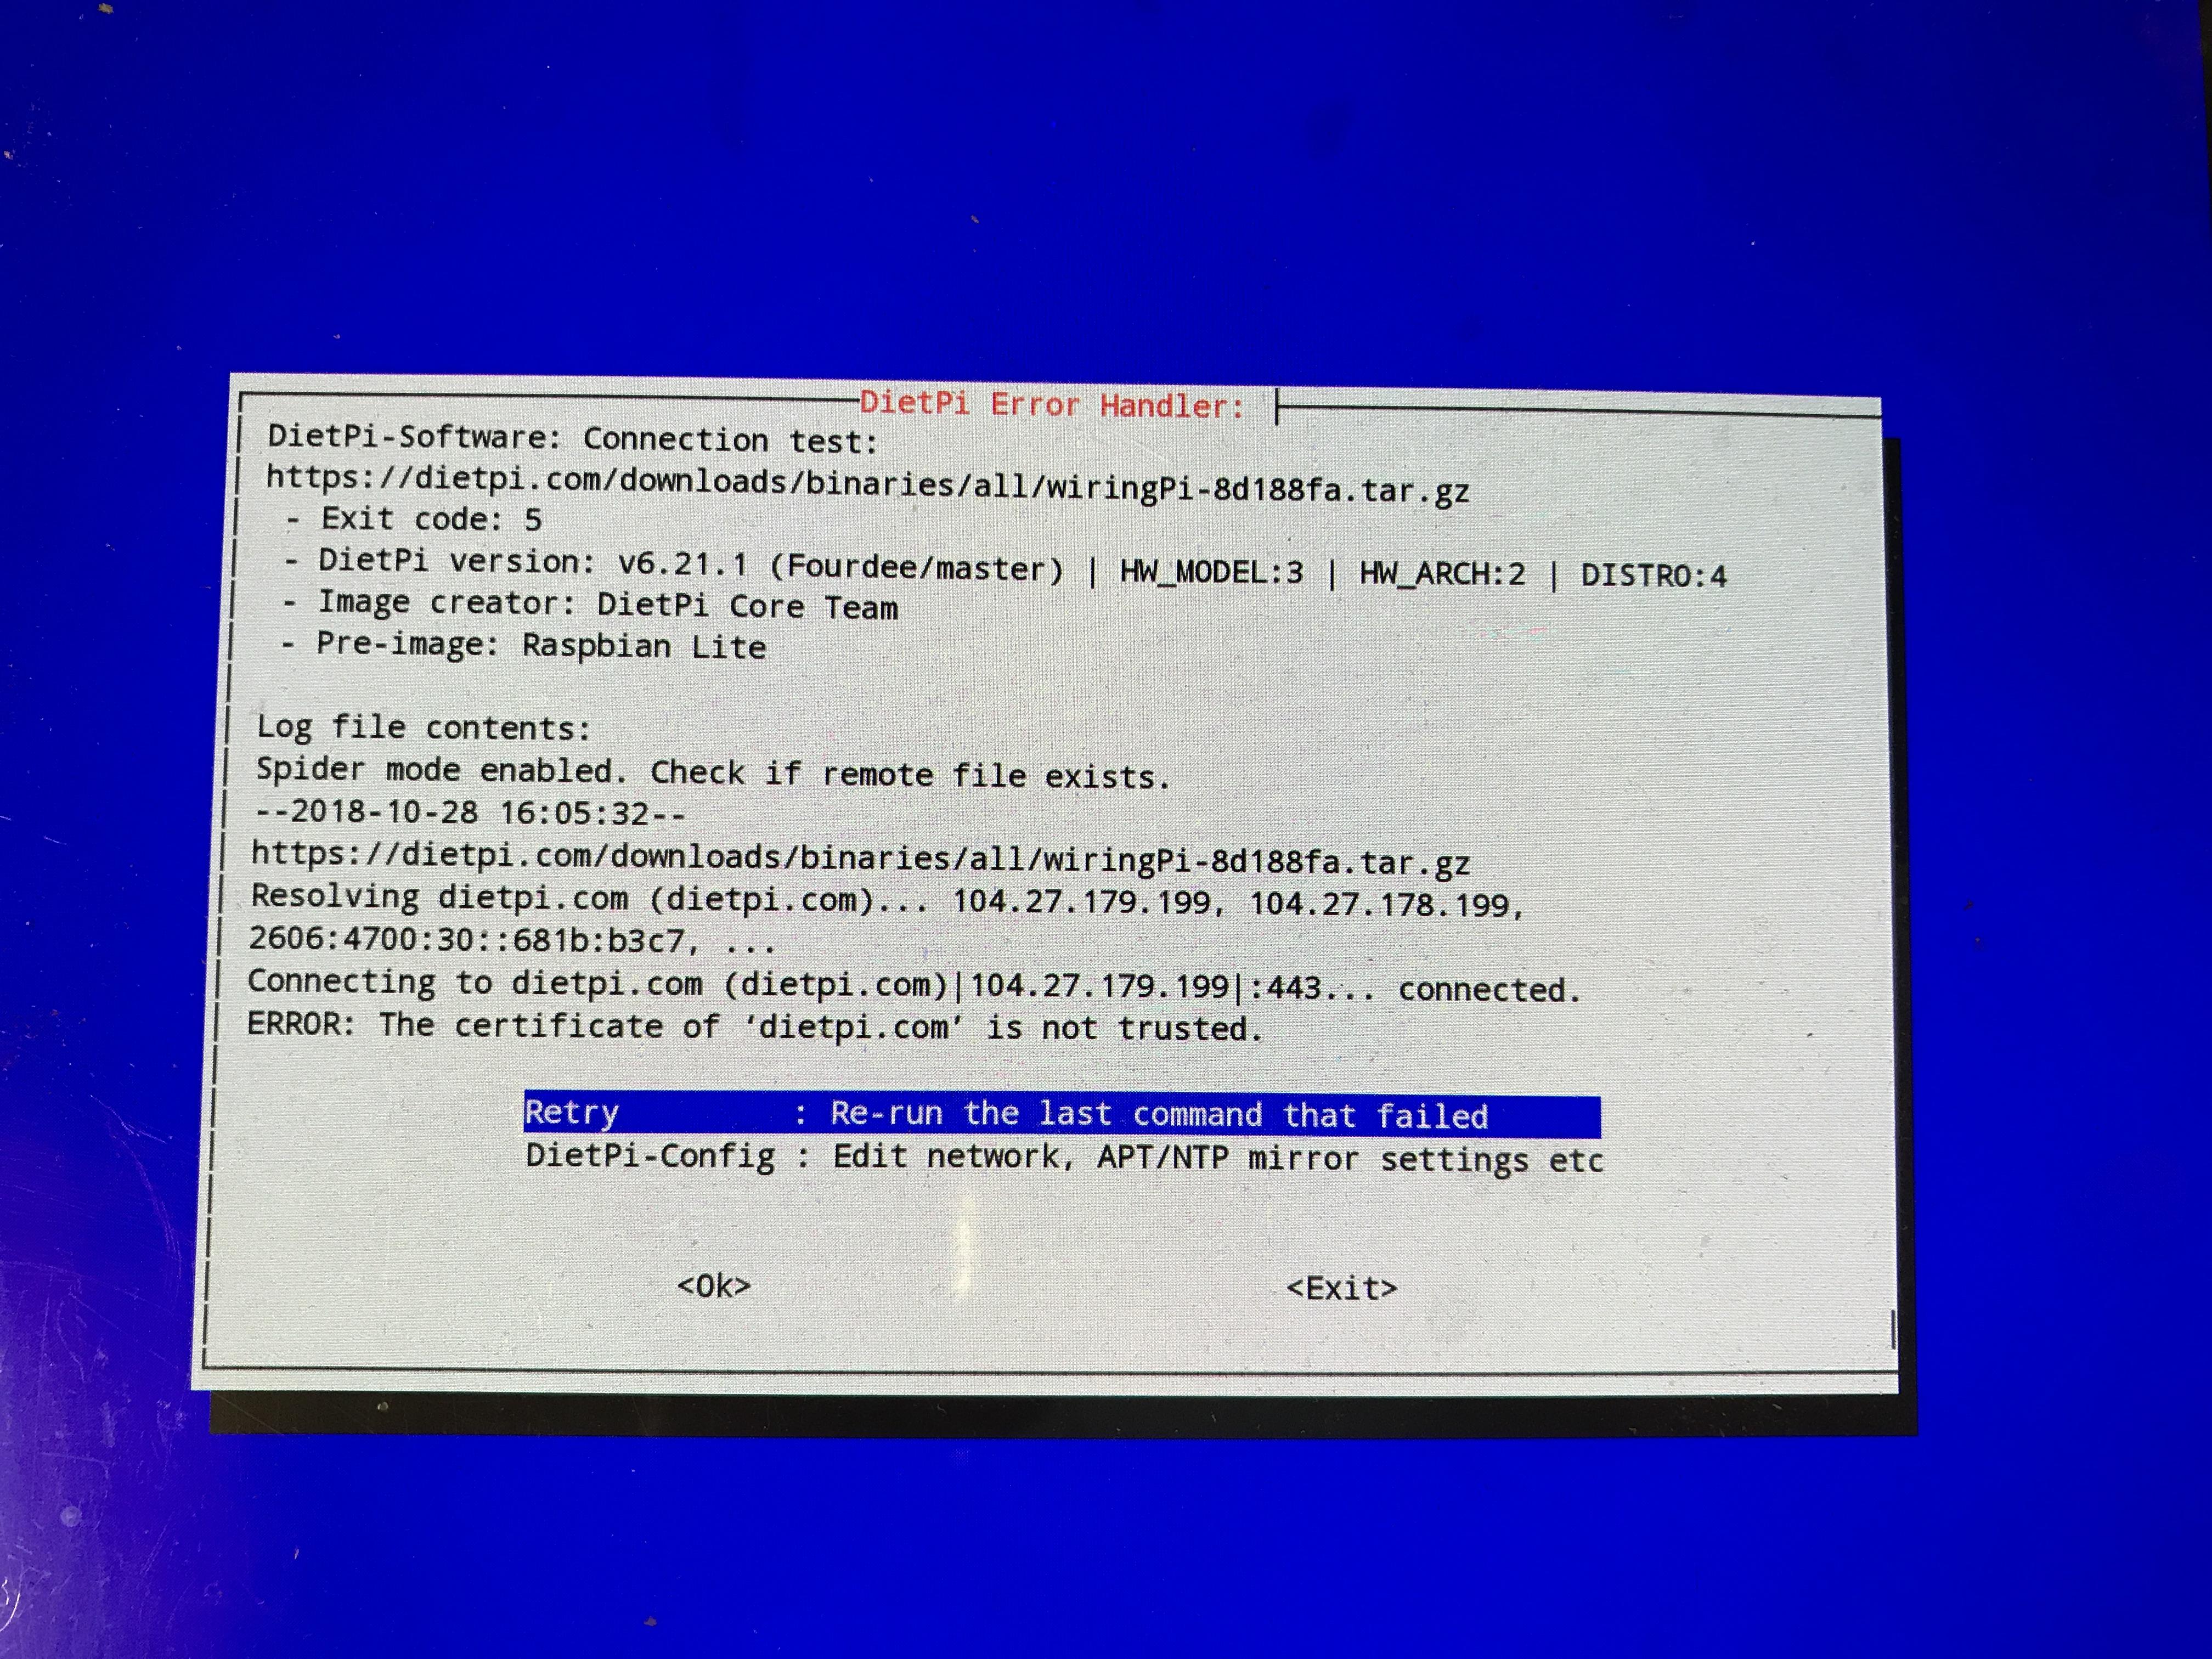 Marvelous System Apt Certificate Error Issue 2612 Michaing Dietpi Github Wiring Digital Resources Antuskbiperorg